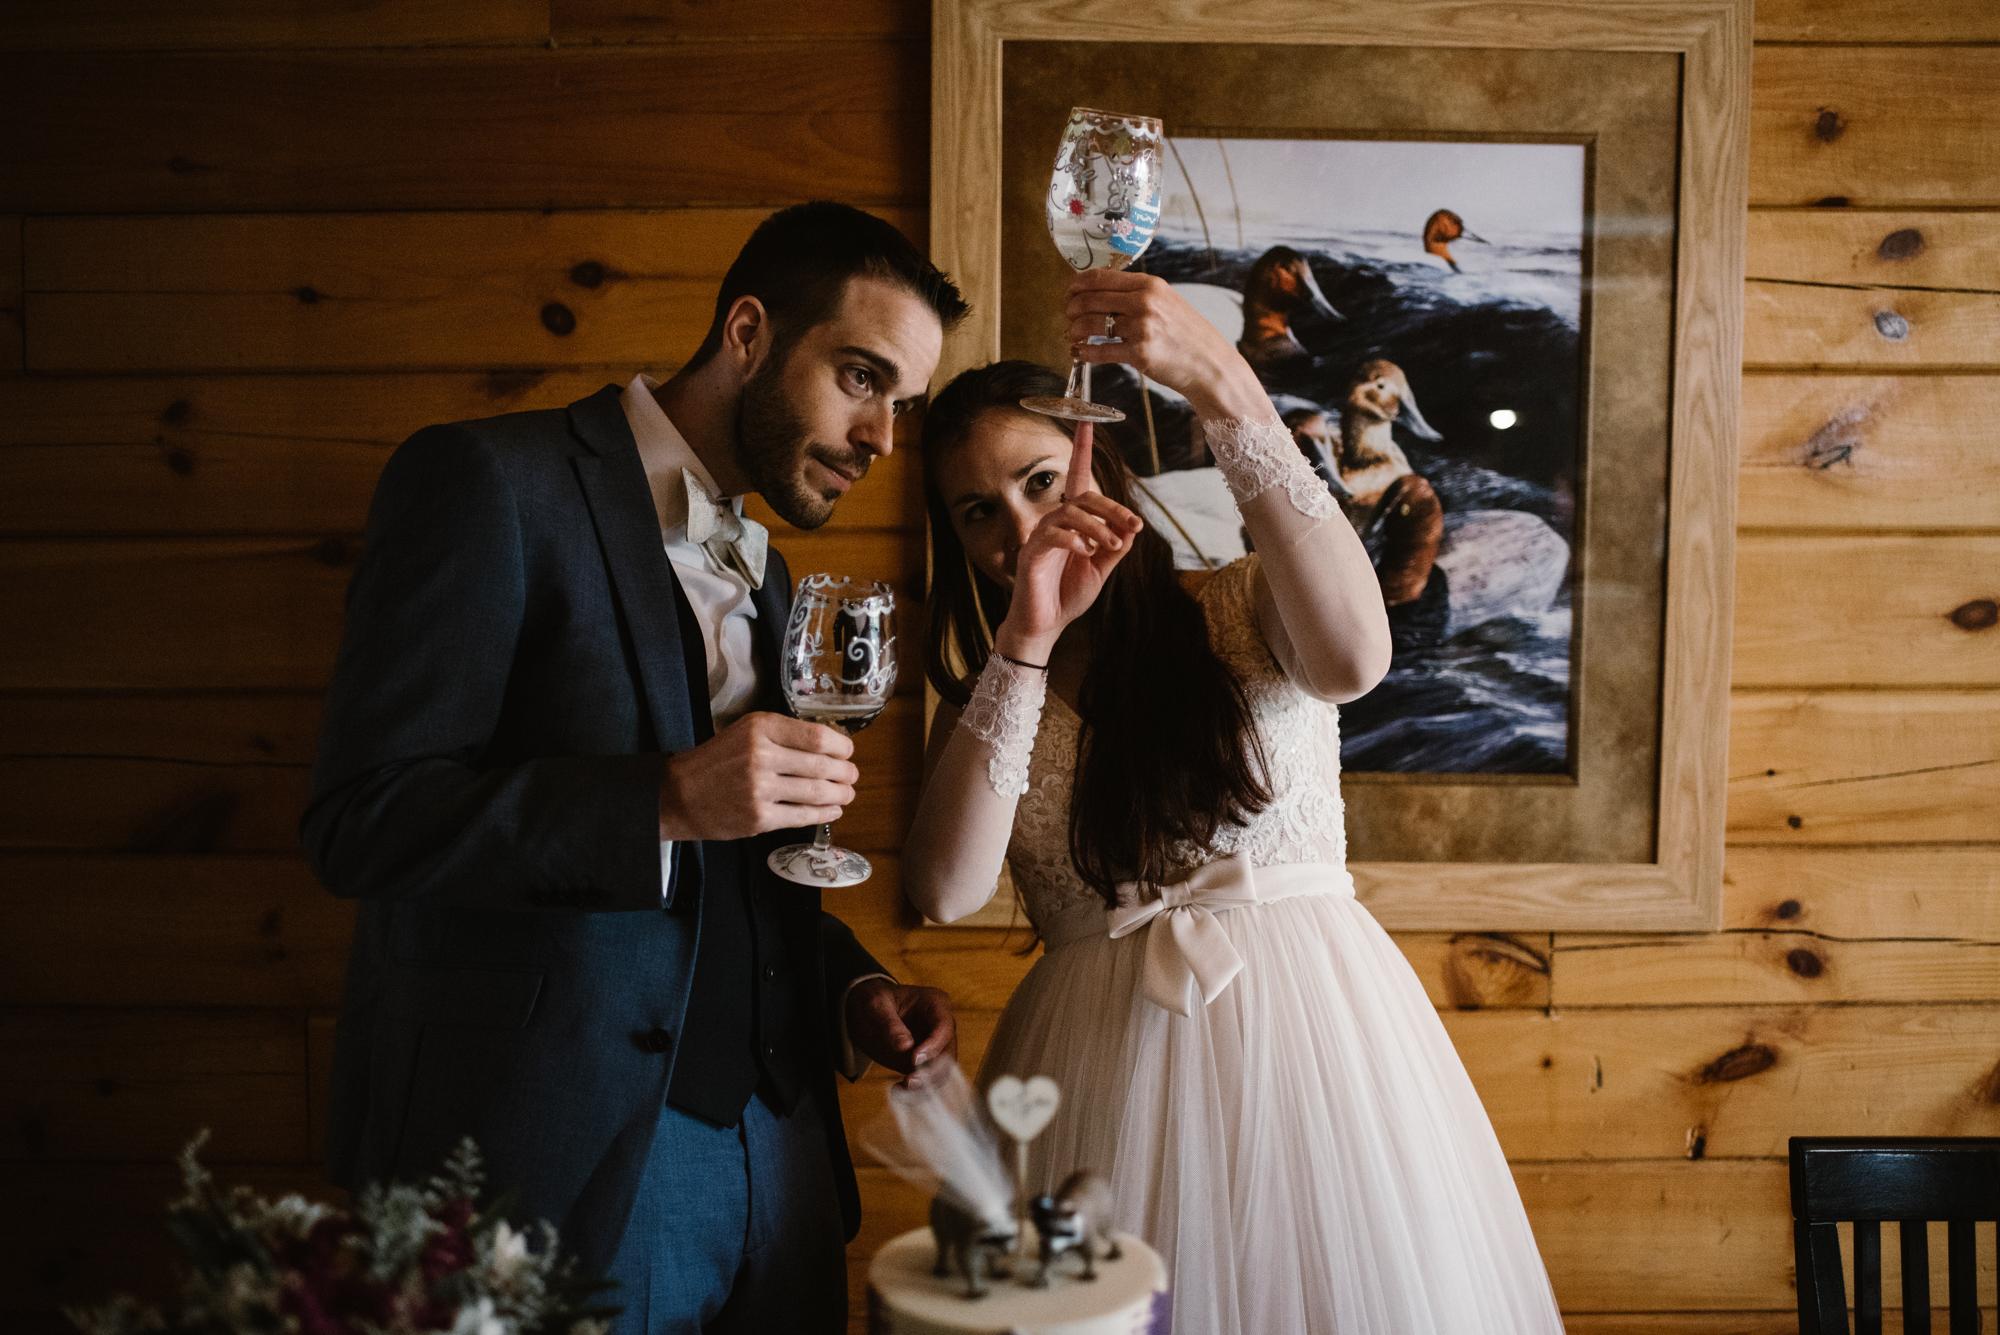 Paula and Andrew - Small Adventurous Wedding in Shenandoah National Park - Blue Ridge Mountain Wedding - White Sails Creative - Mountain Elopement_59.jpg